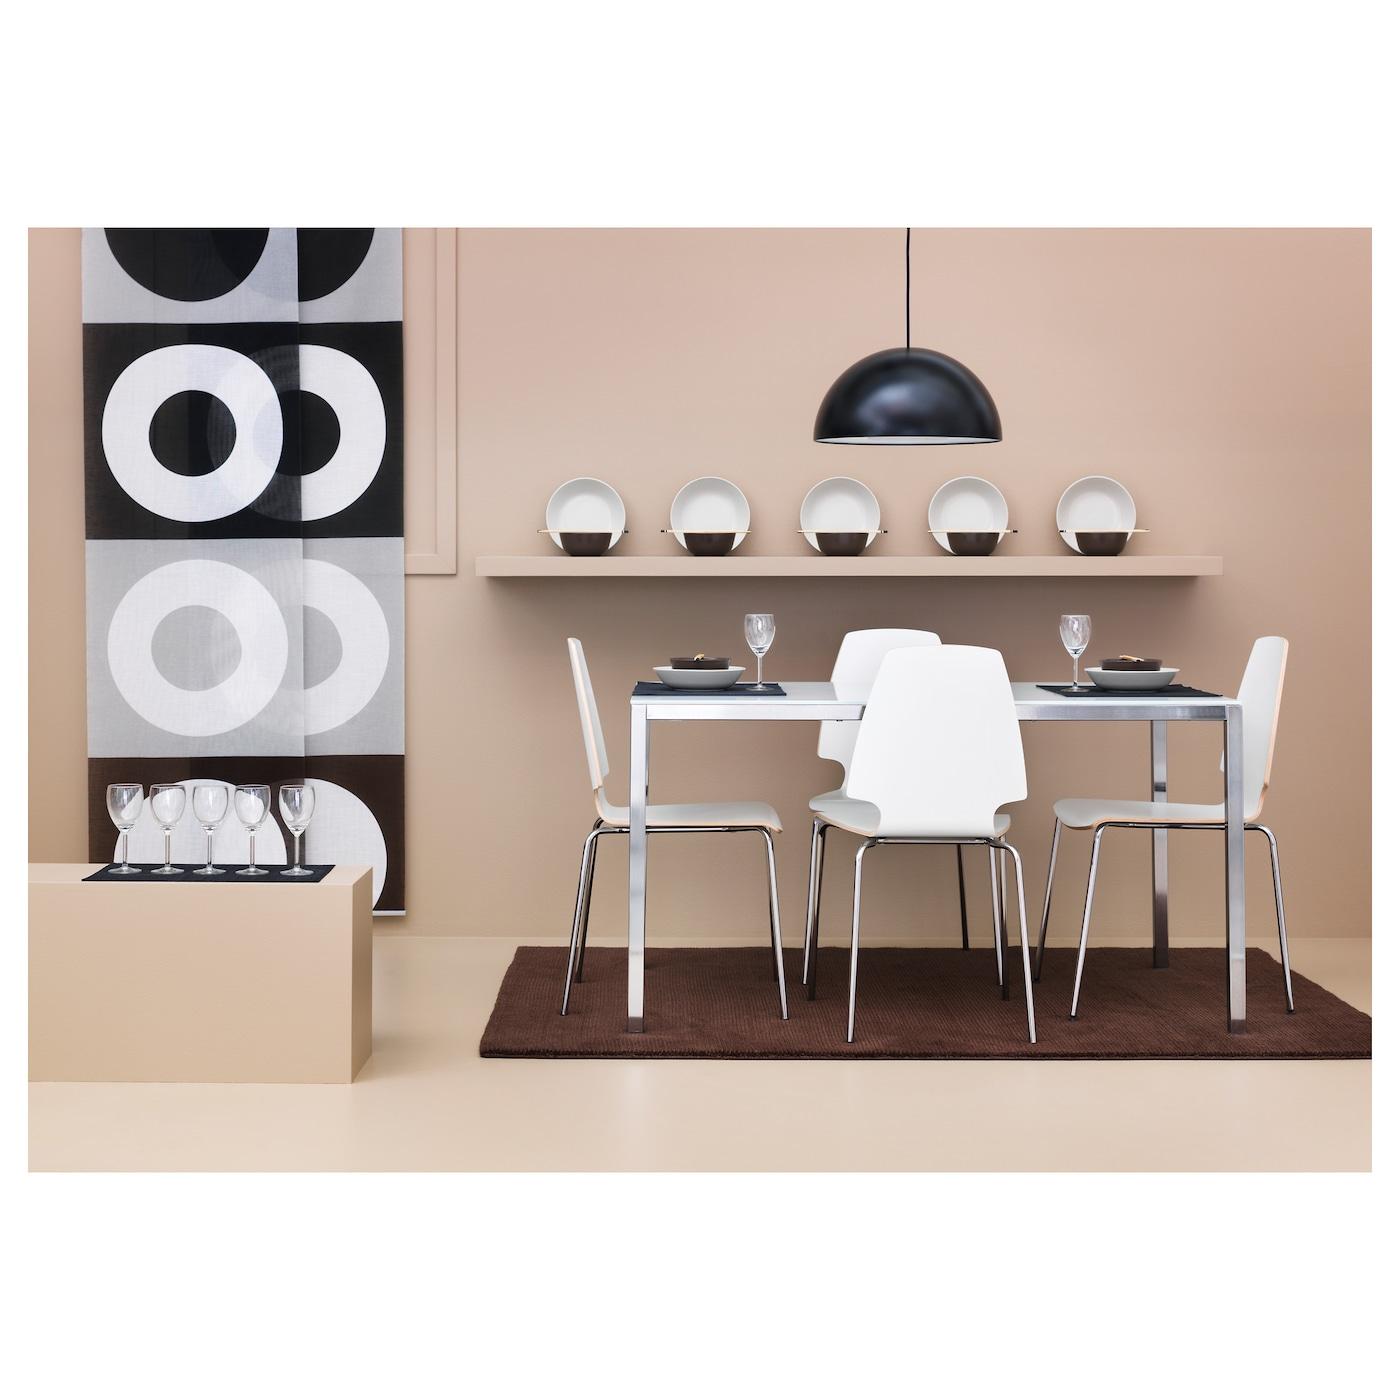 IKEA TORSBY Table Seats 4.